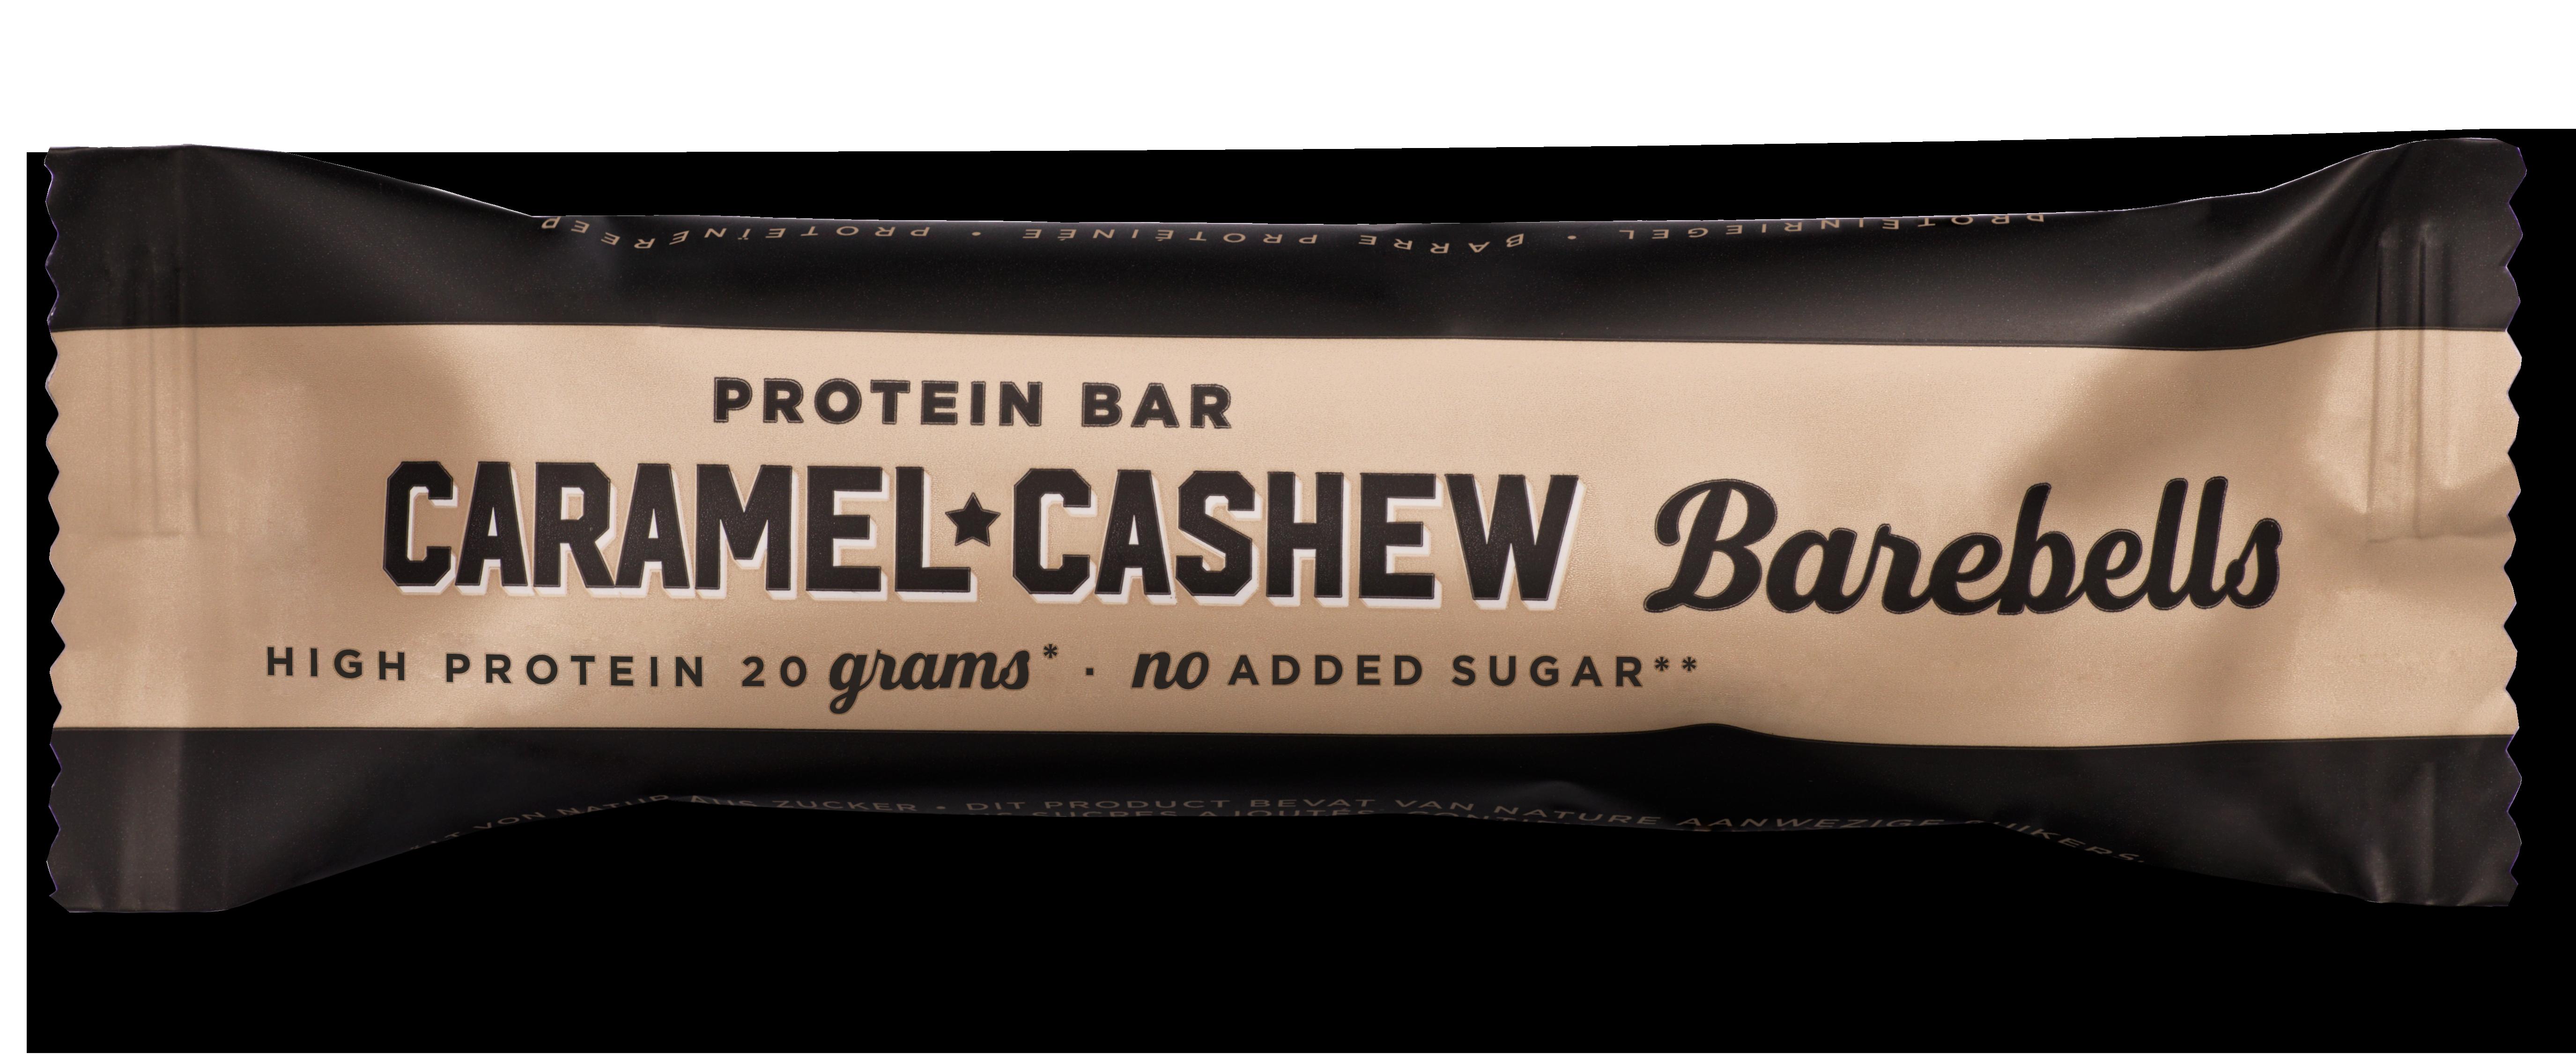 Caramel Cashew